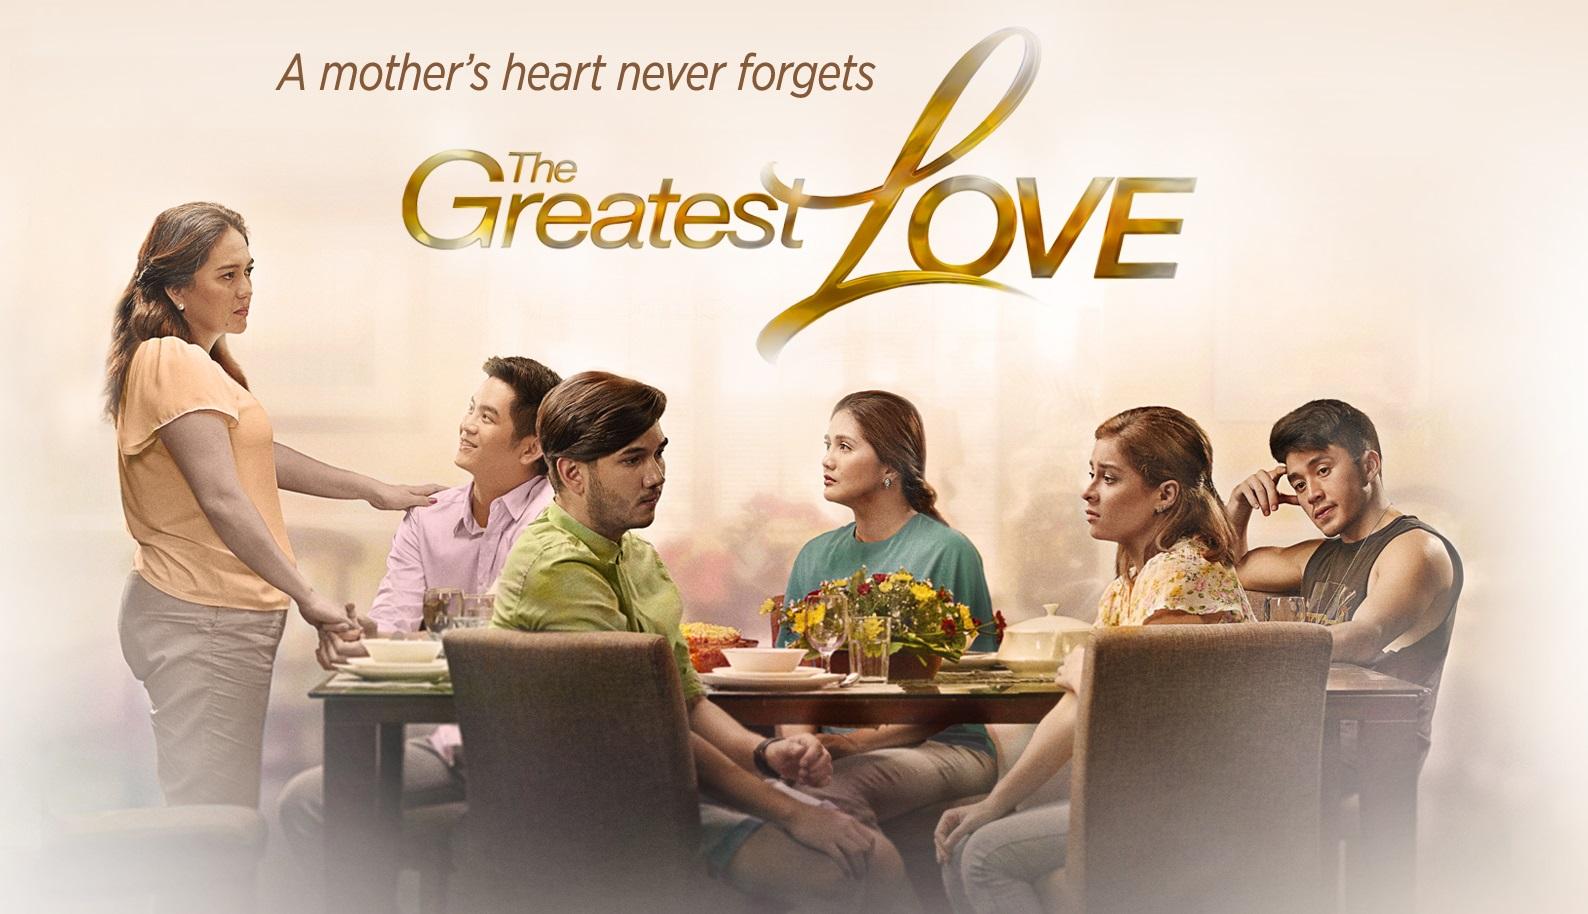 The Greatest Love (2016) luôn lôi cuốn khán giả